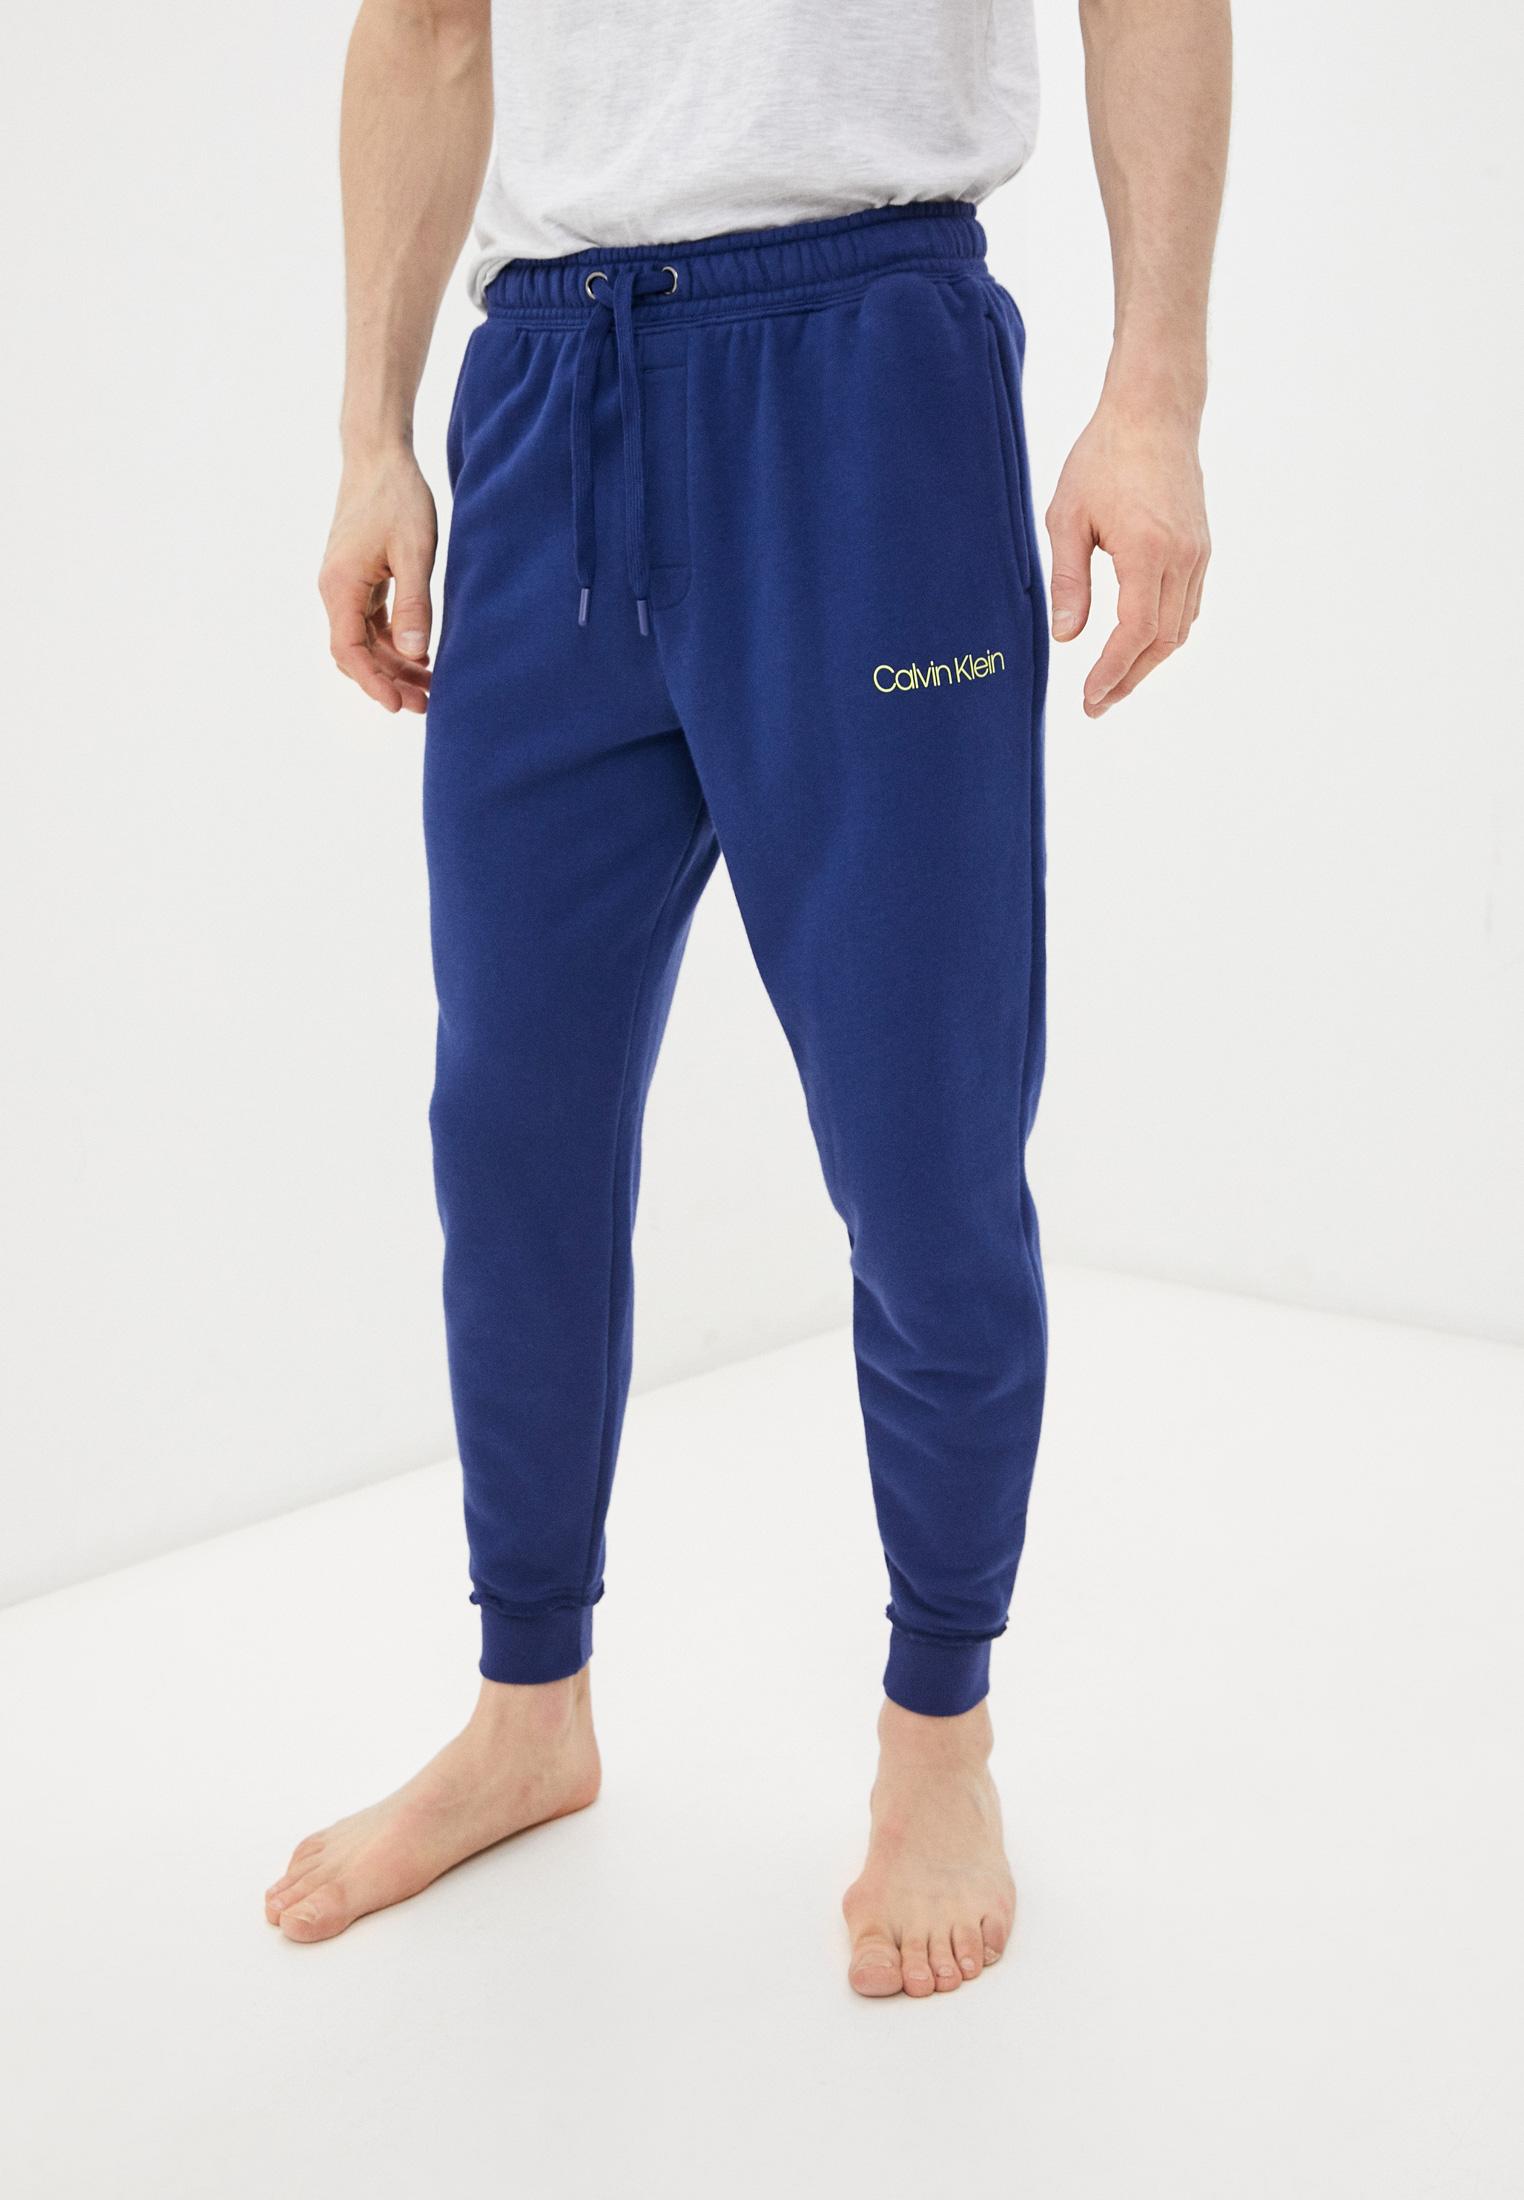 Мужские домашние брюки Calvin Klein Underwear (Кельвин Кляйн Андервеар) NM2167E